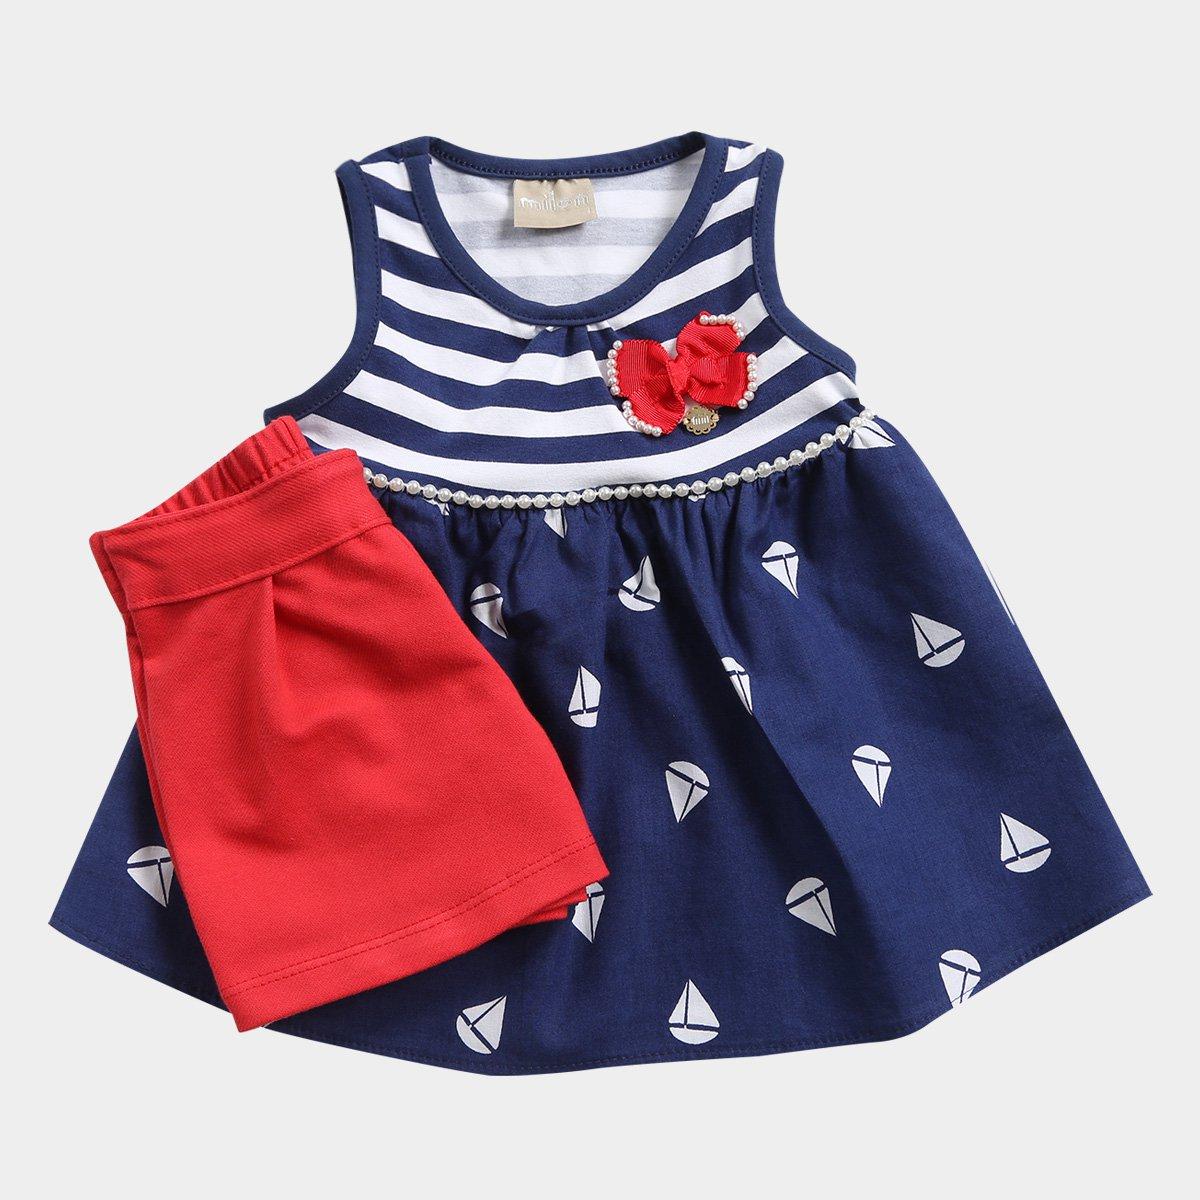 Barquinhos Infantil Milon Listrada Conjunto Navy Feminino Conjunto Azul Infantil w6xqYBg6vZ